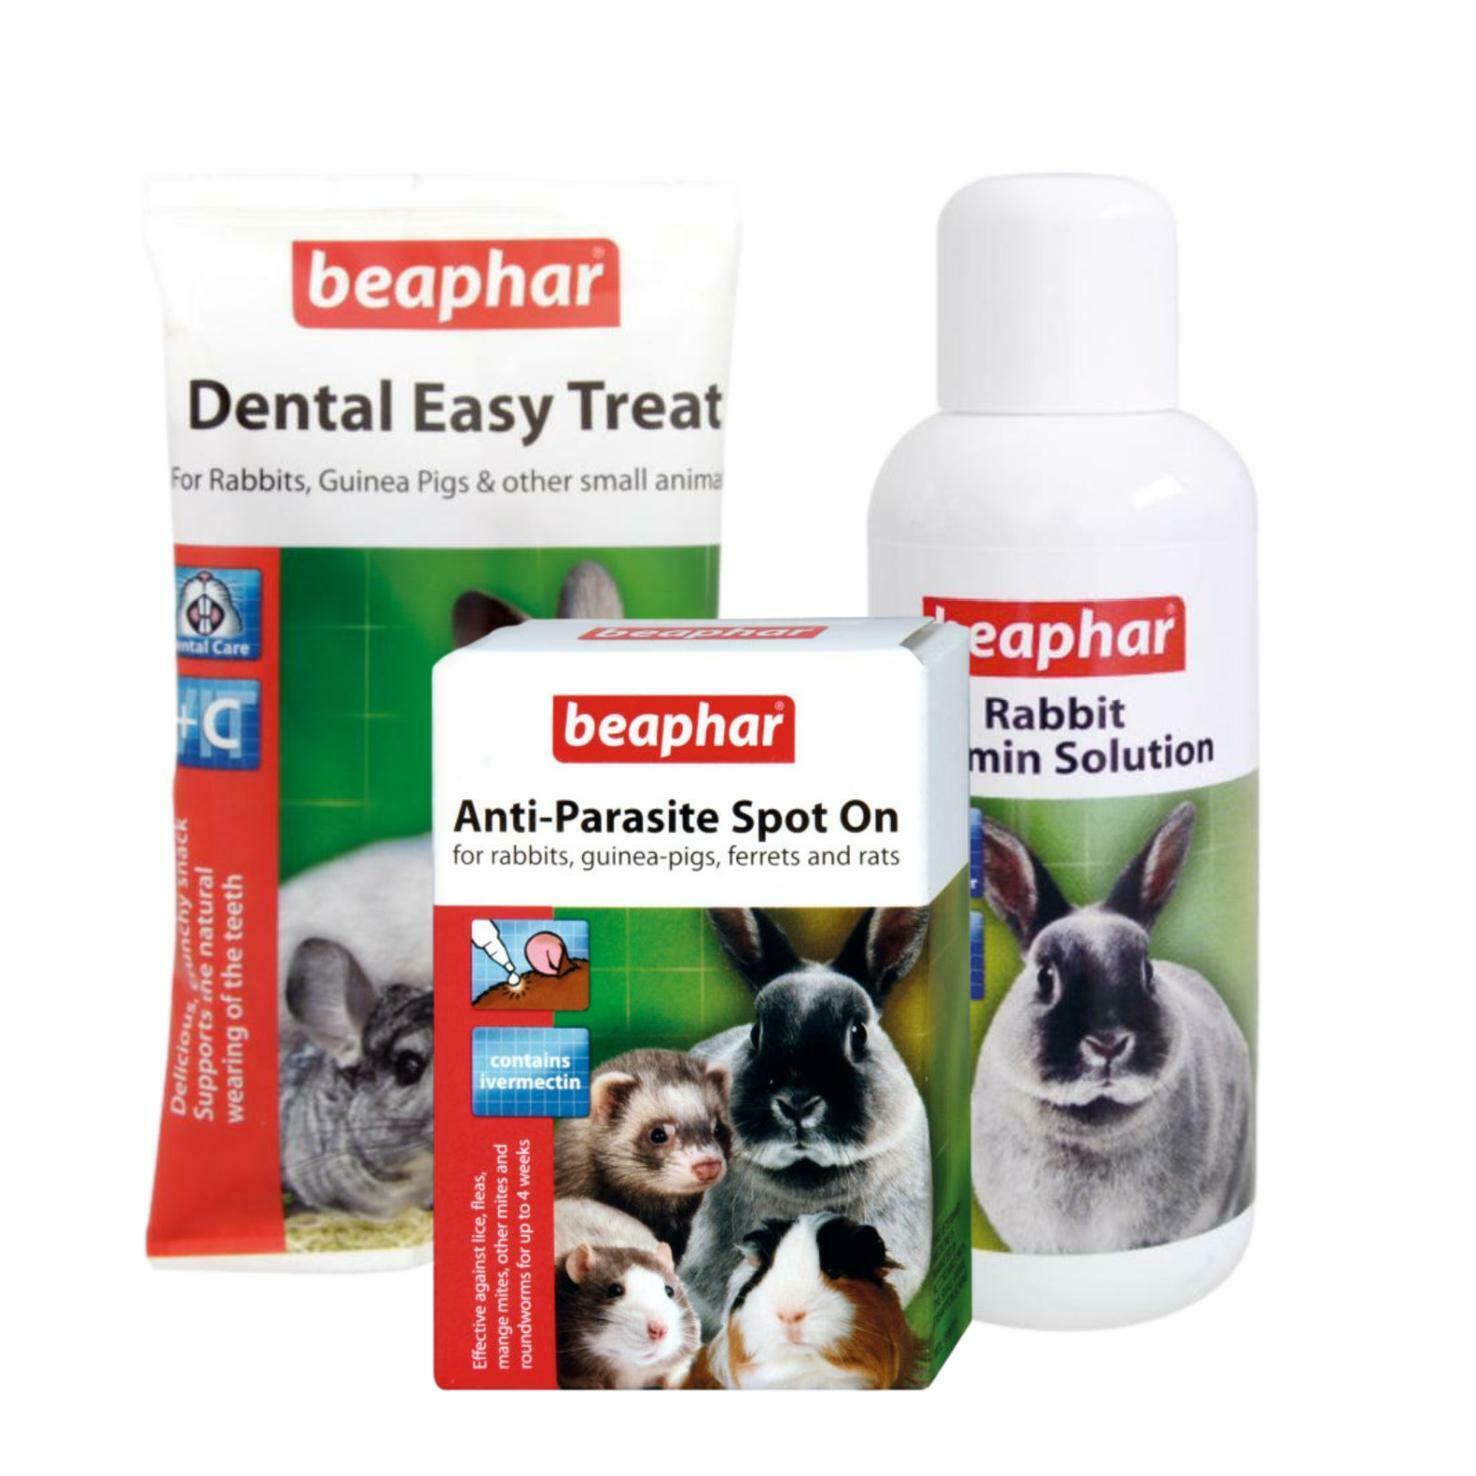 BEAPHAR Healthy Rabbit Bundle 3pc